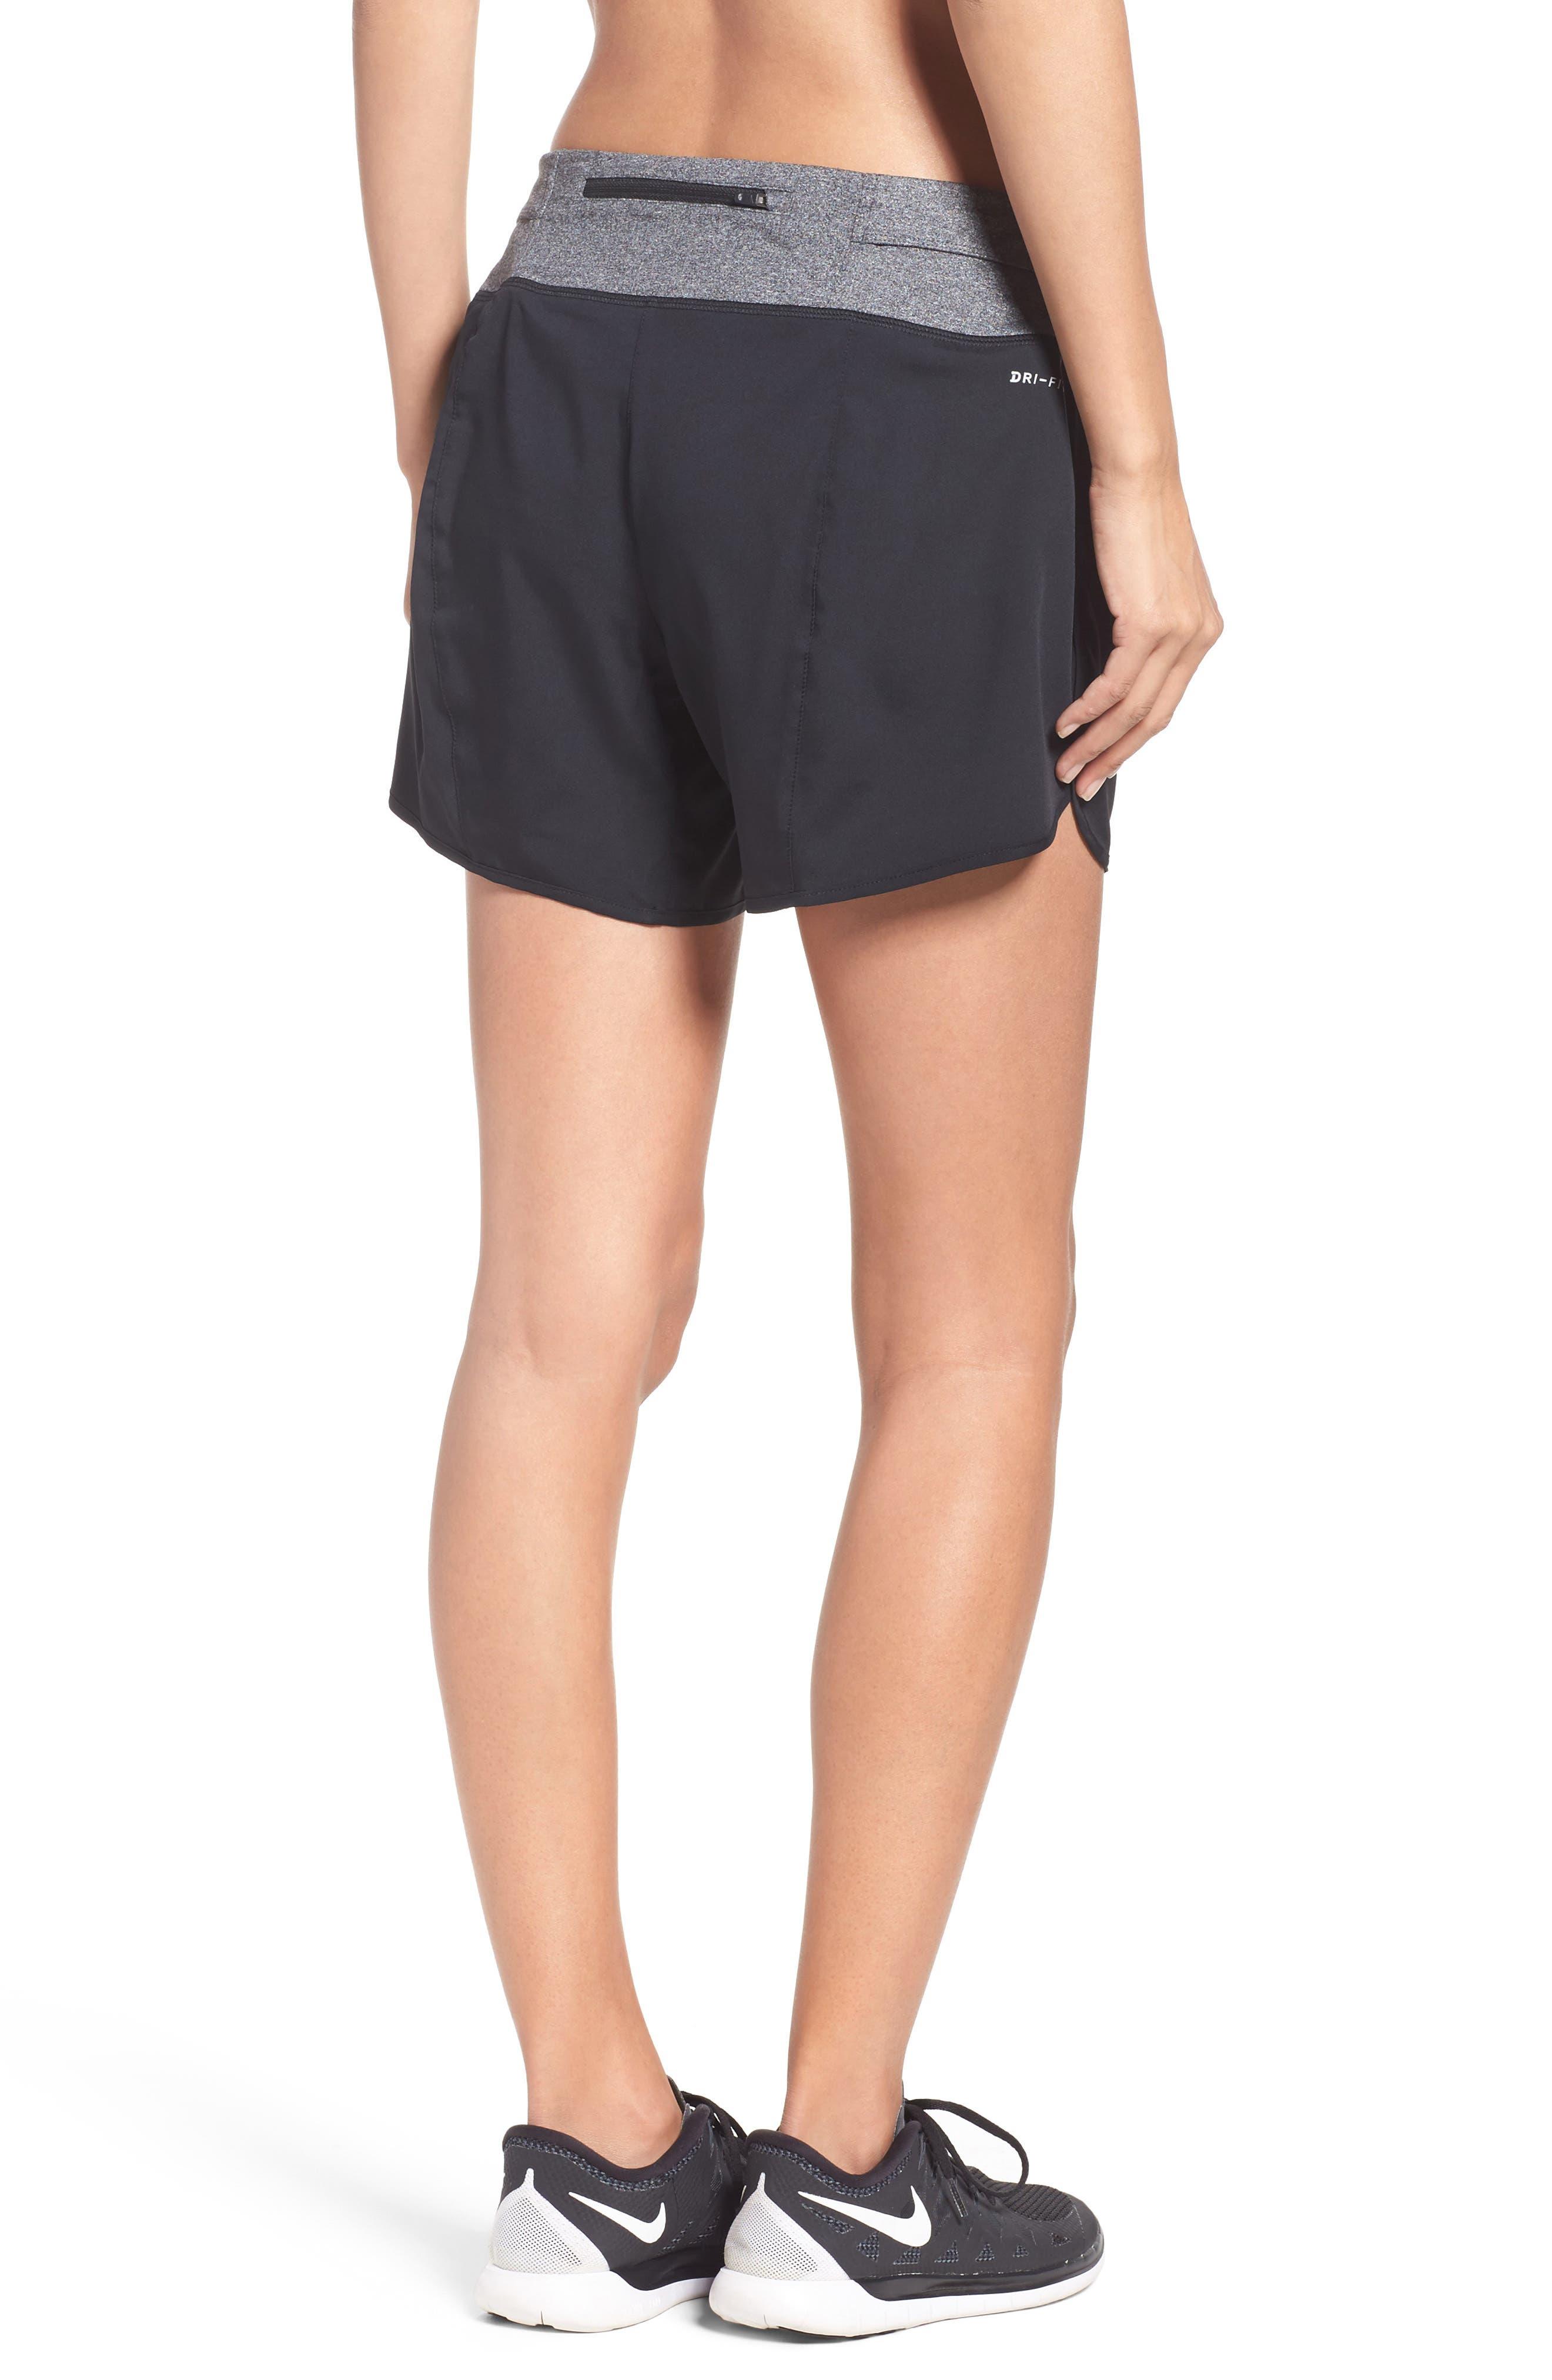 Flex Running Shorts,                             Alternate thumbnail 2, color,                             Black